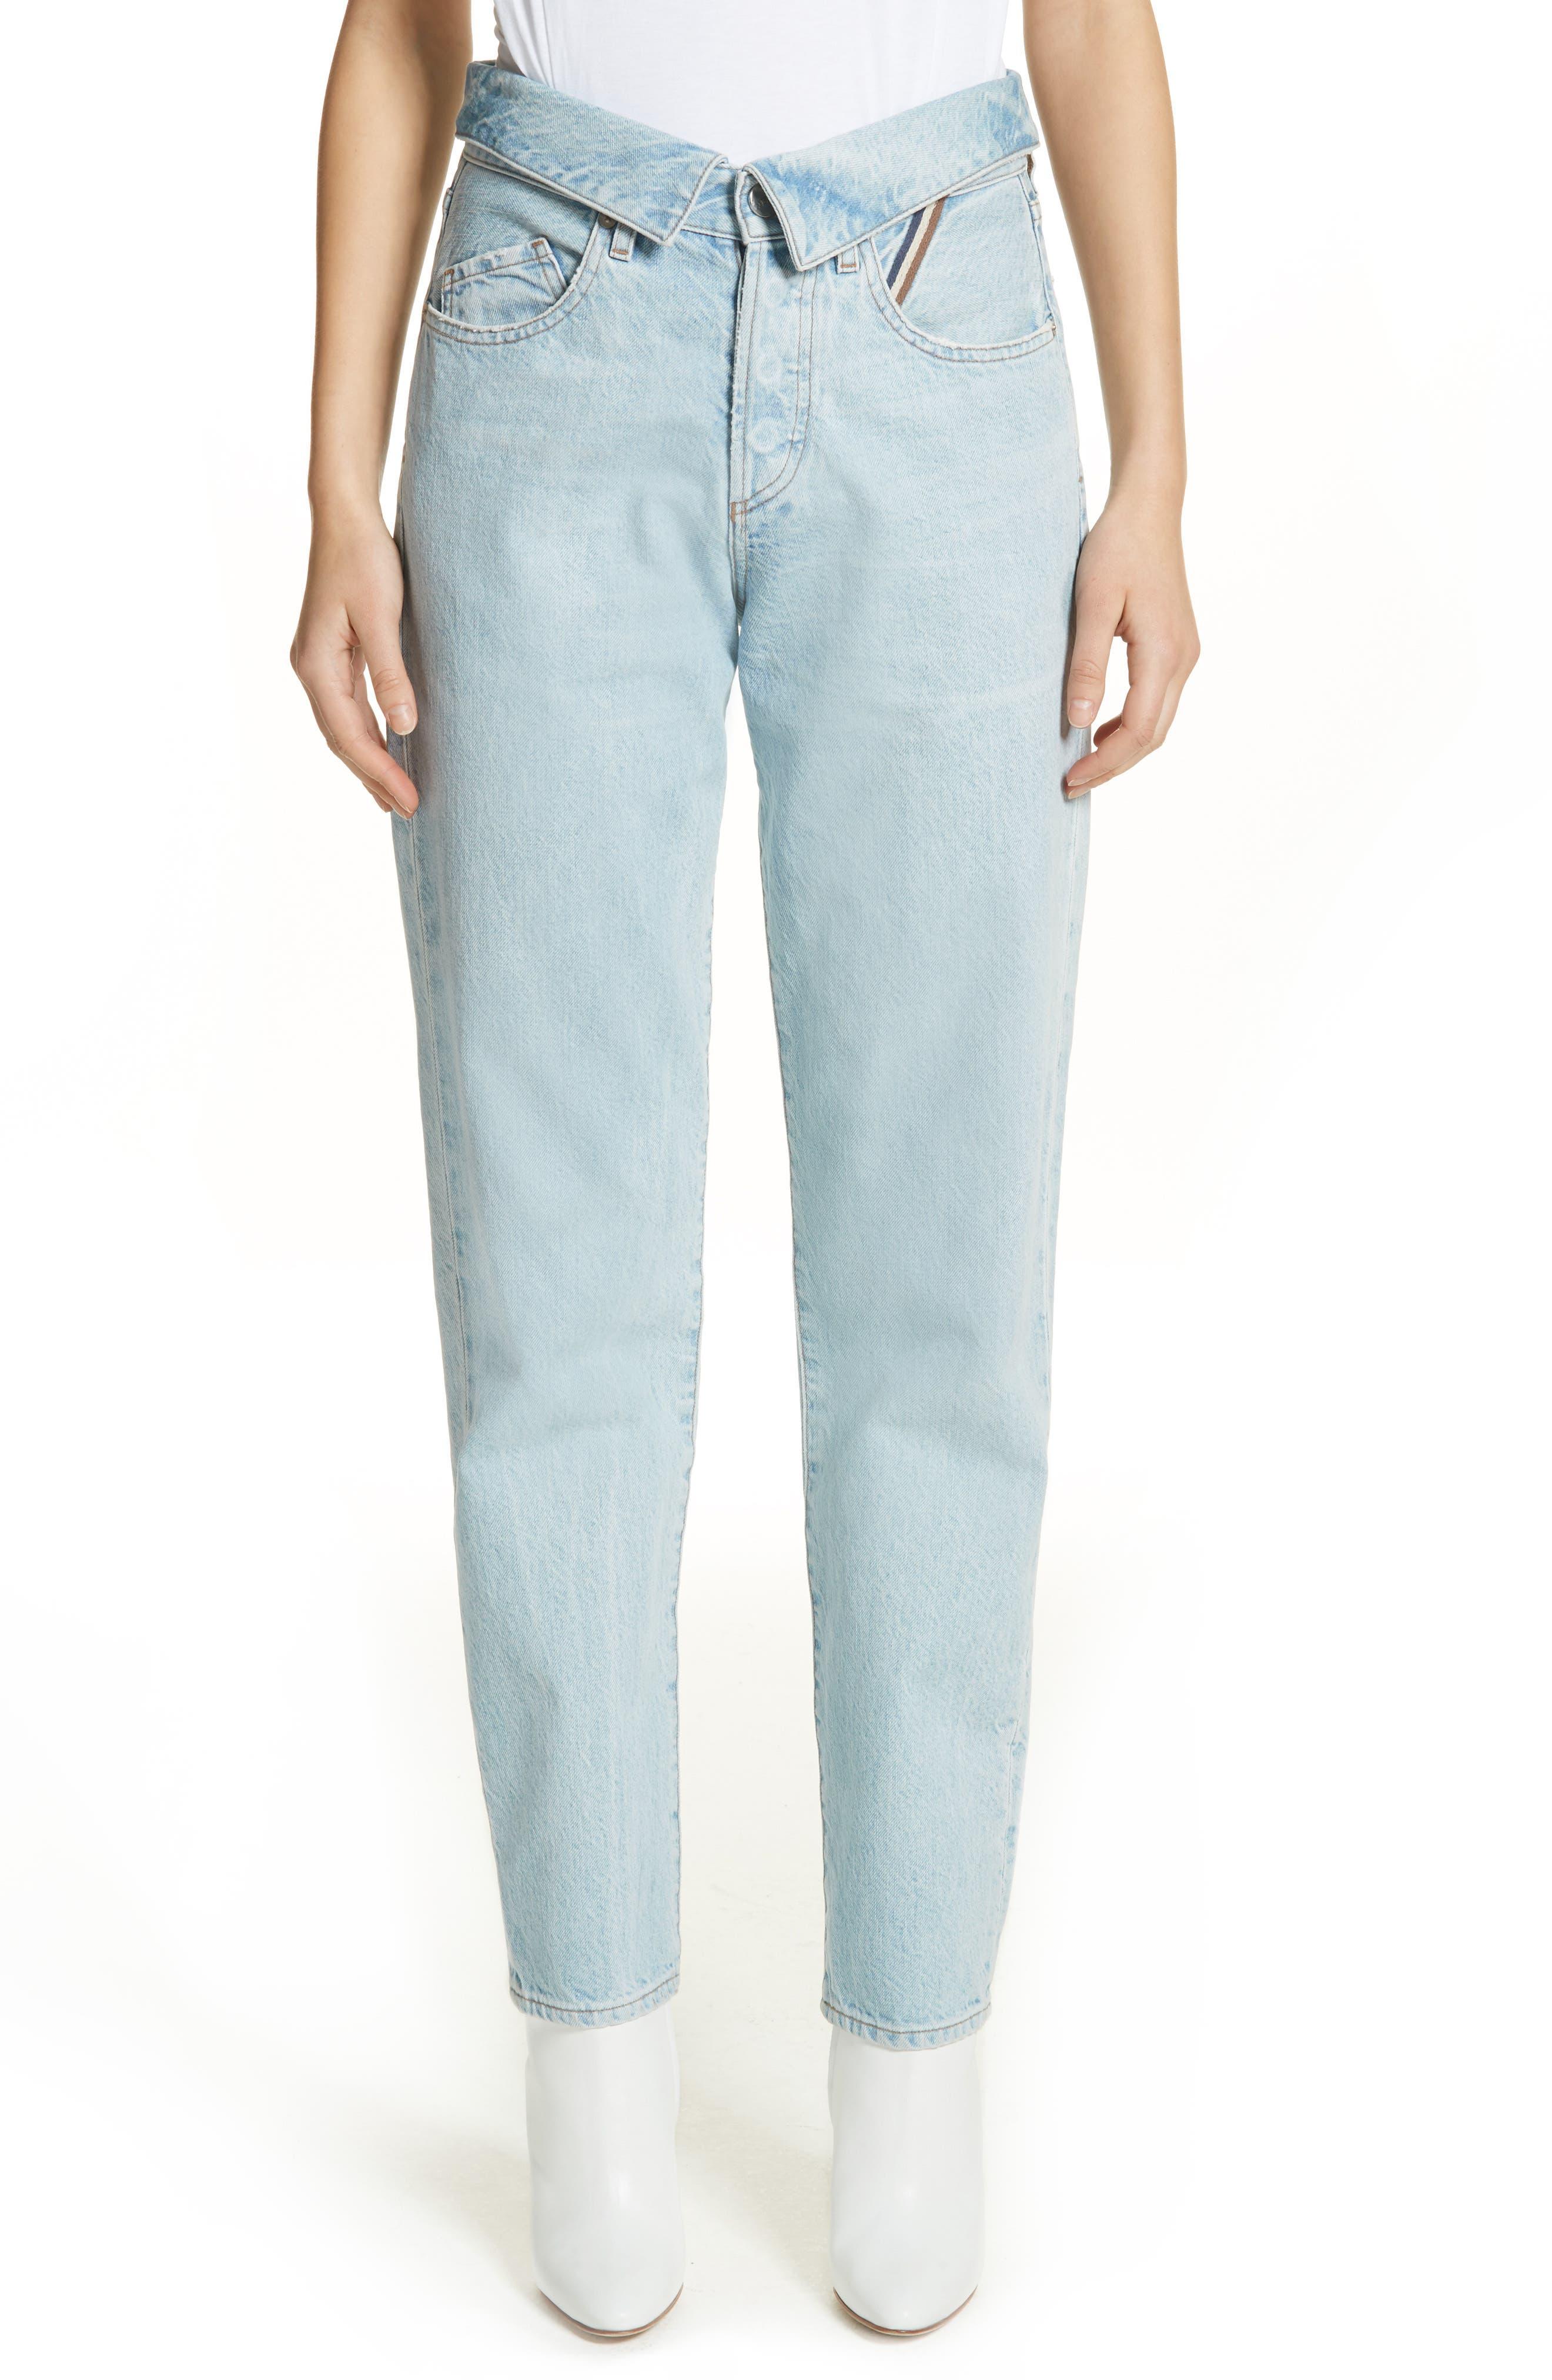 Alternate Image 1 Selected - Jean Atelier Flip Straight Leg Jeans (Sky)